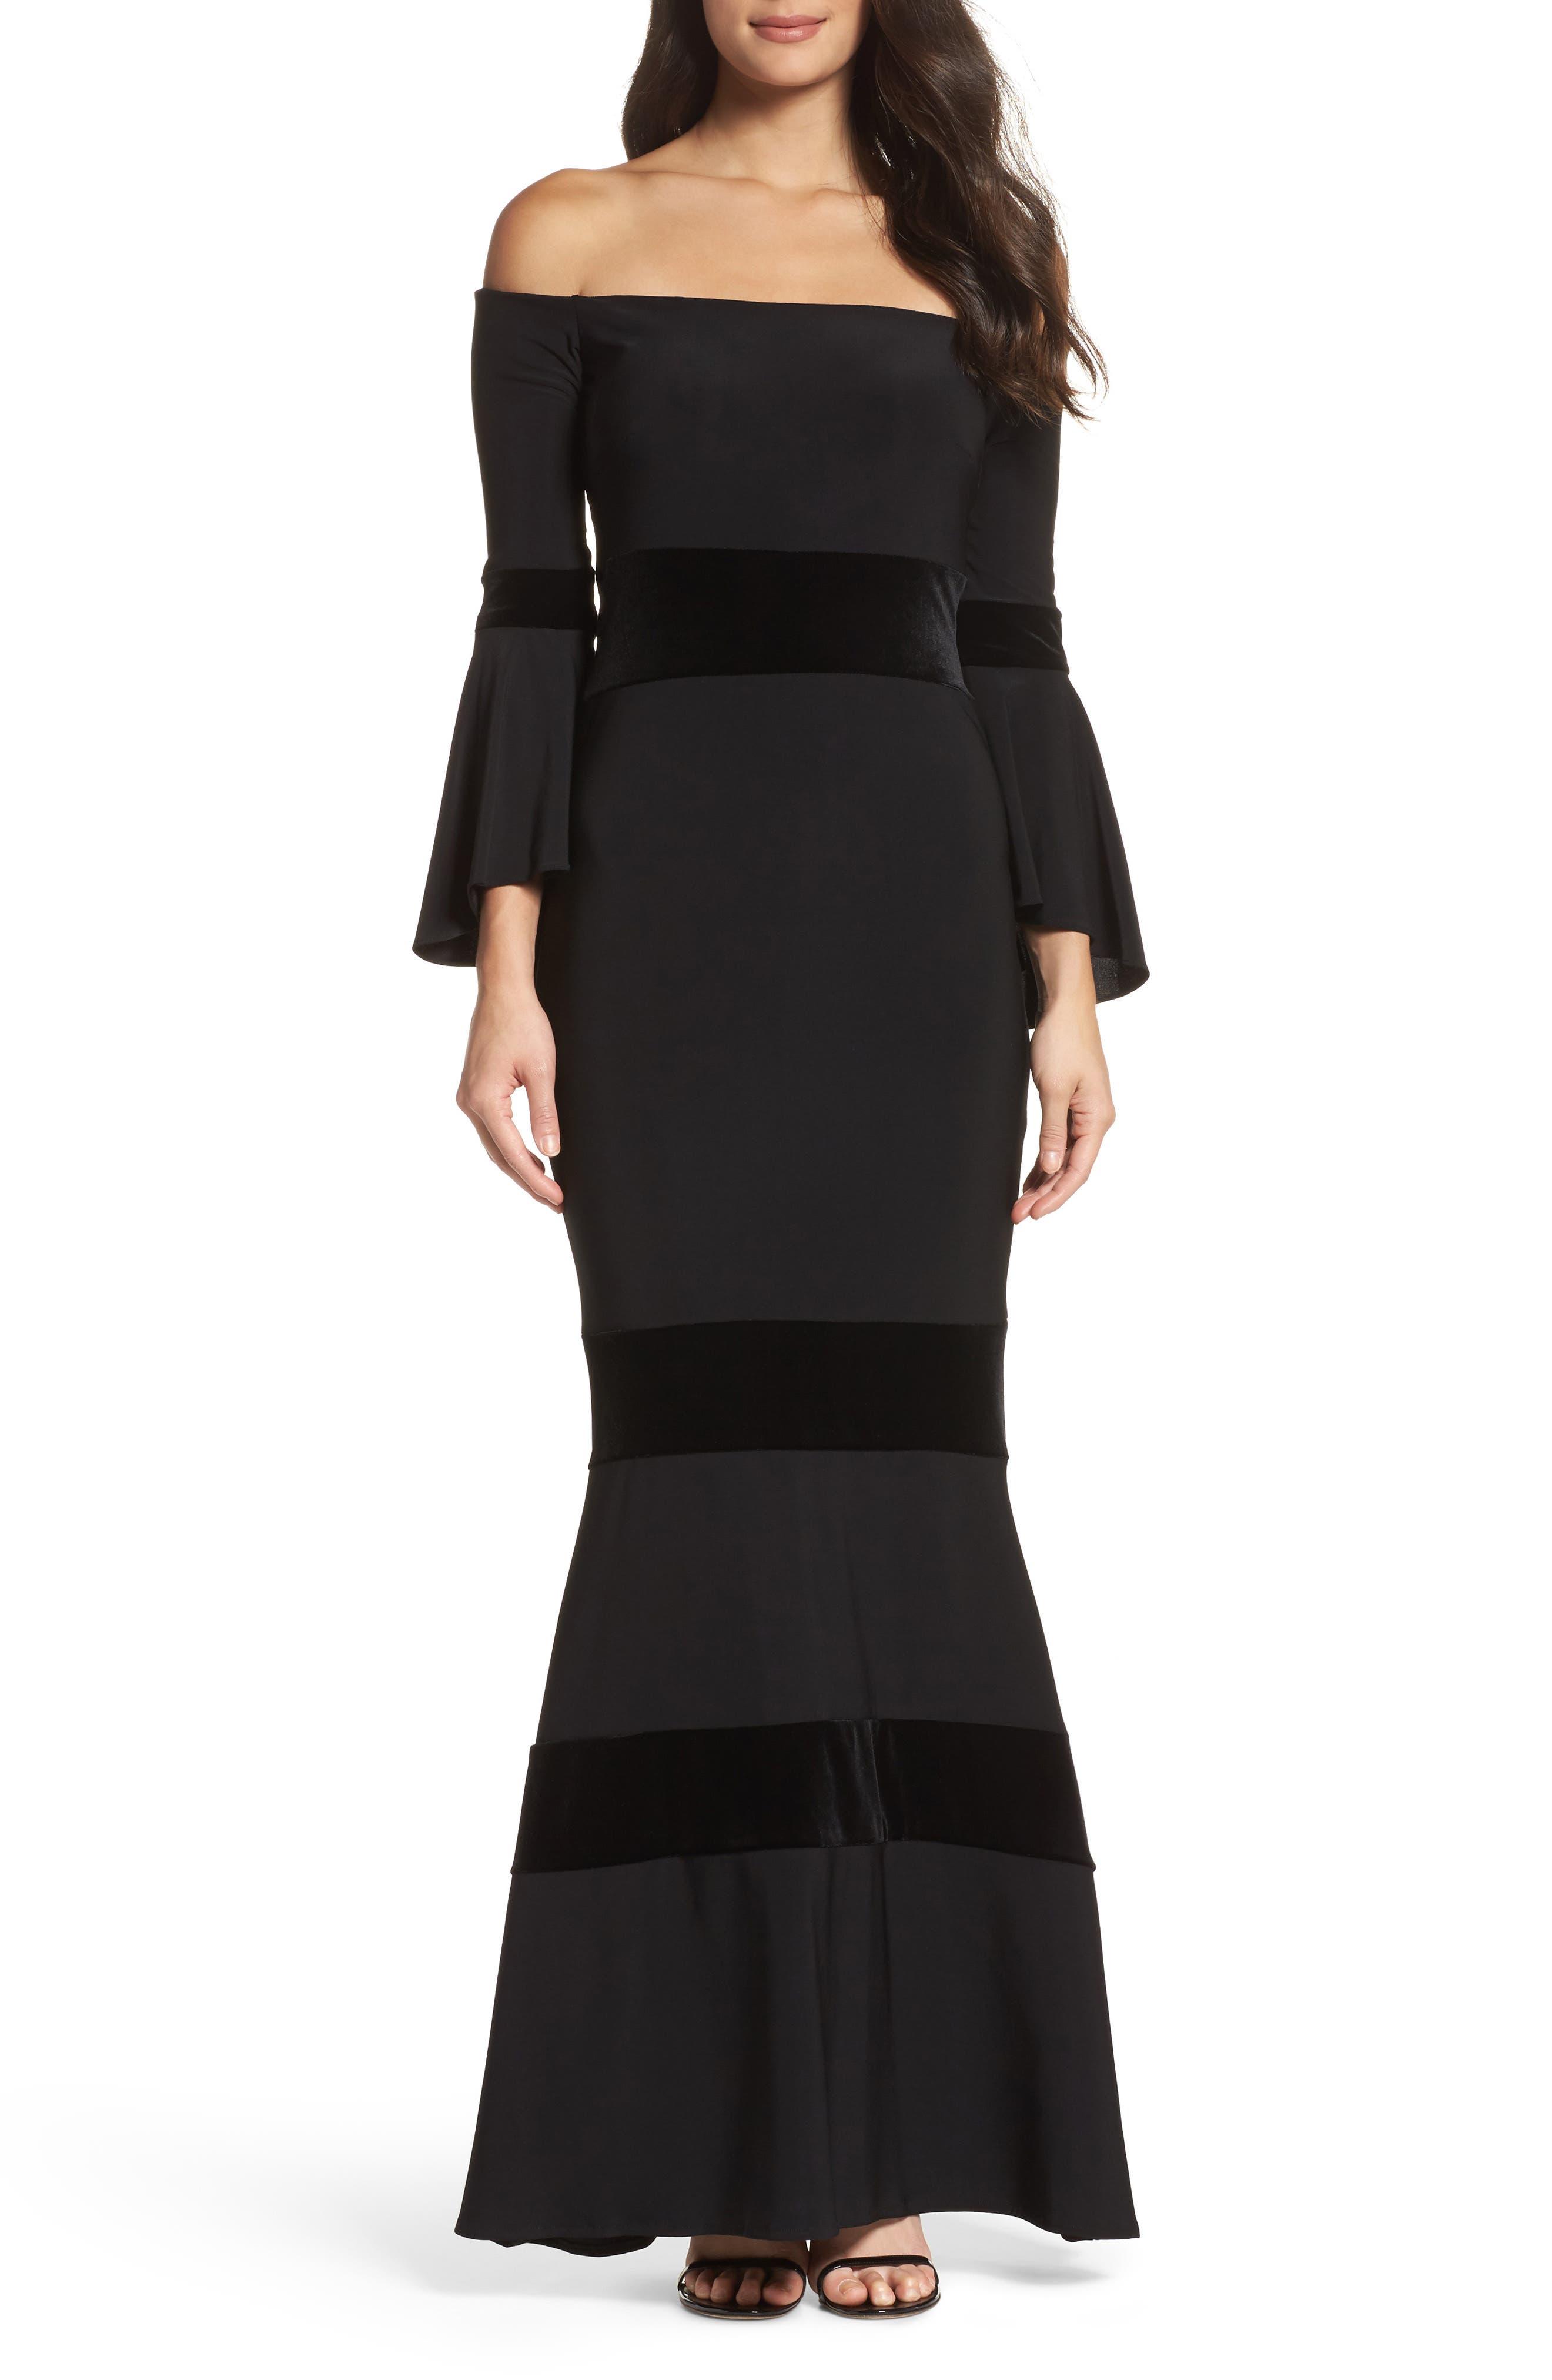 Velvet Trim Off the Shoulder Mermaid Dress,                         Main,                         color, Black